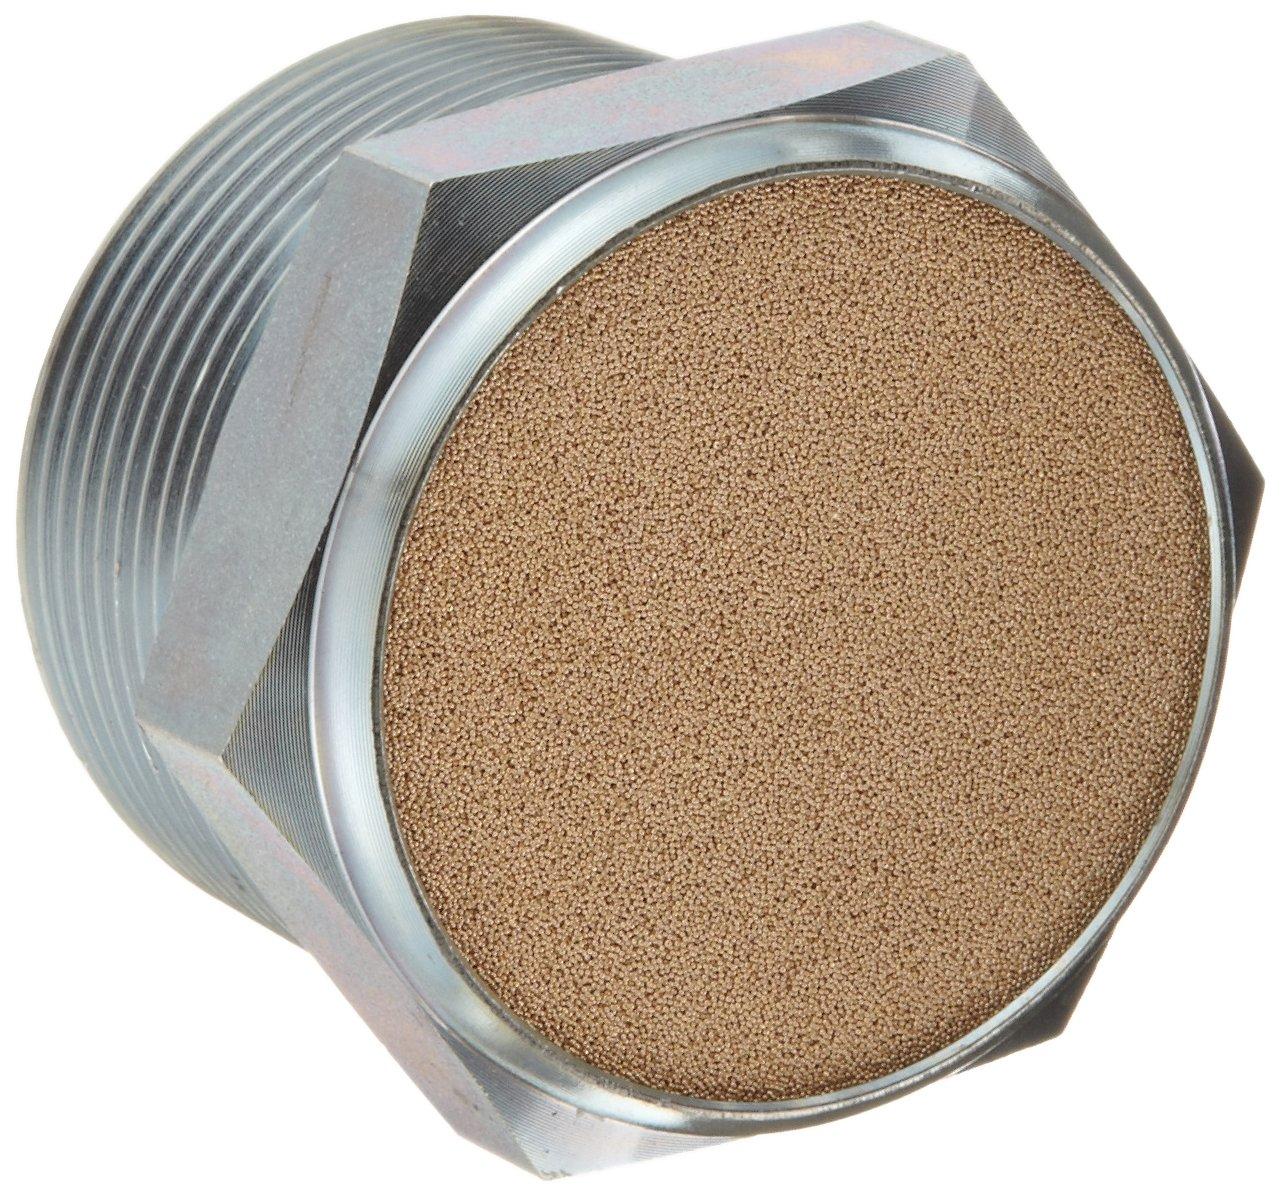 Parker 047240024 Sintered Bronze Breather Vent, 1-1/2'' NPT Male, 1.5'' Length, 150 psi